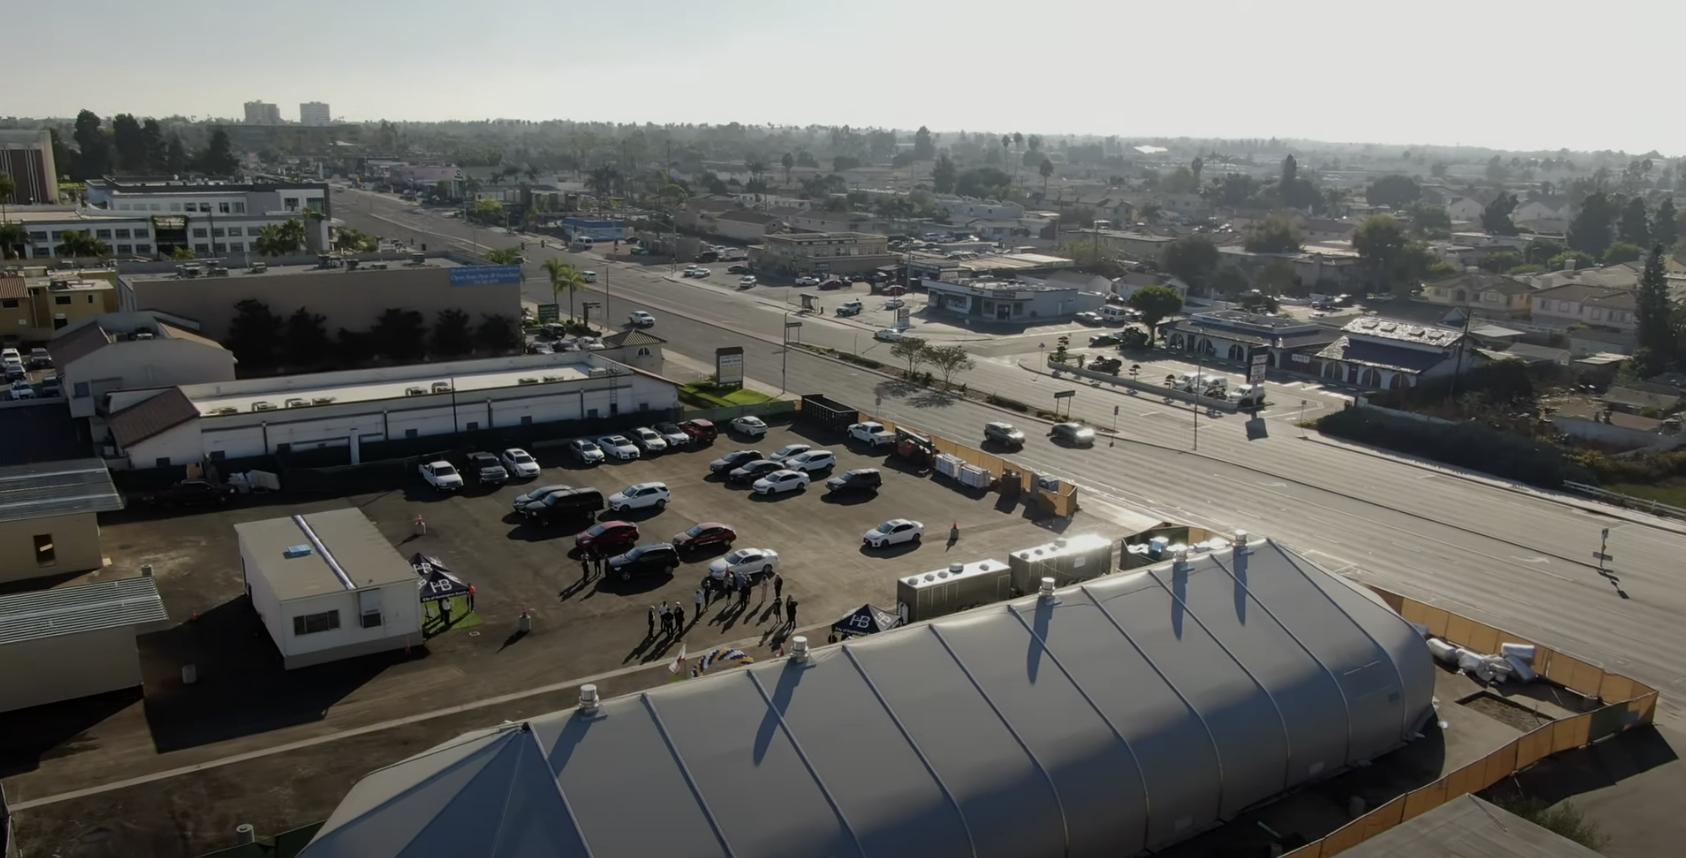 A Brief Look Inside the Huntington Beach Navigation Center